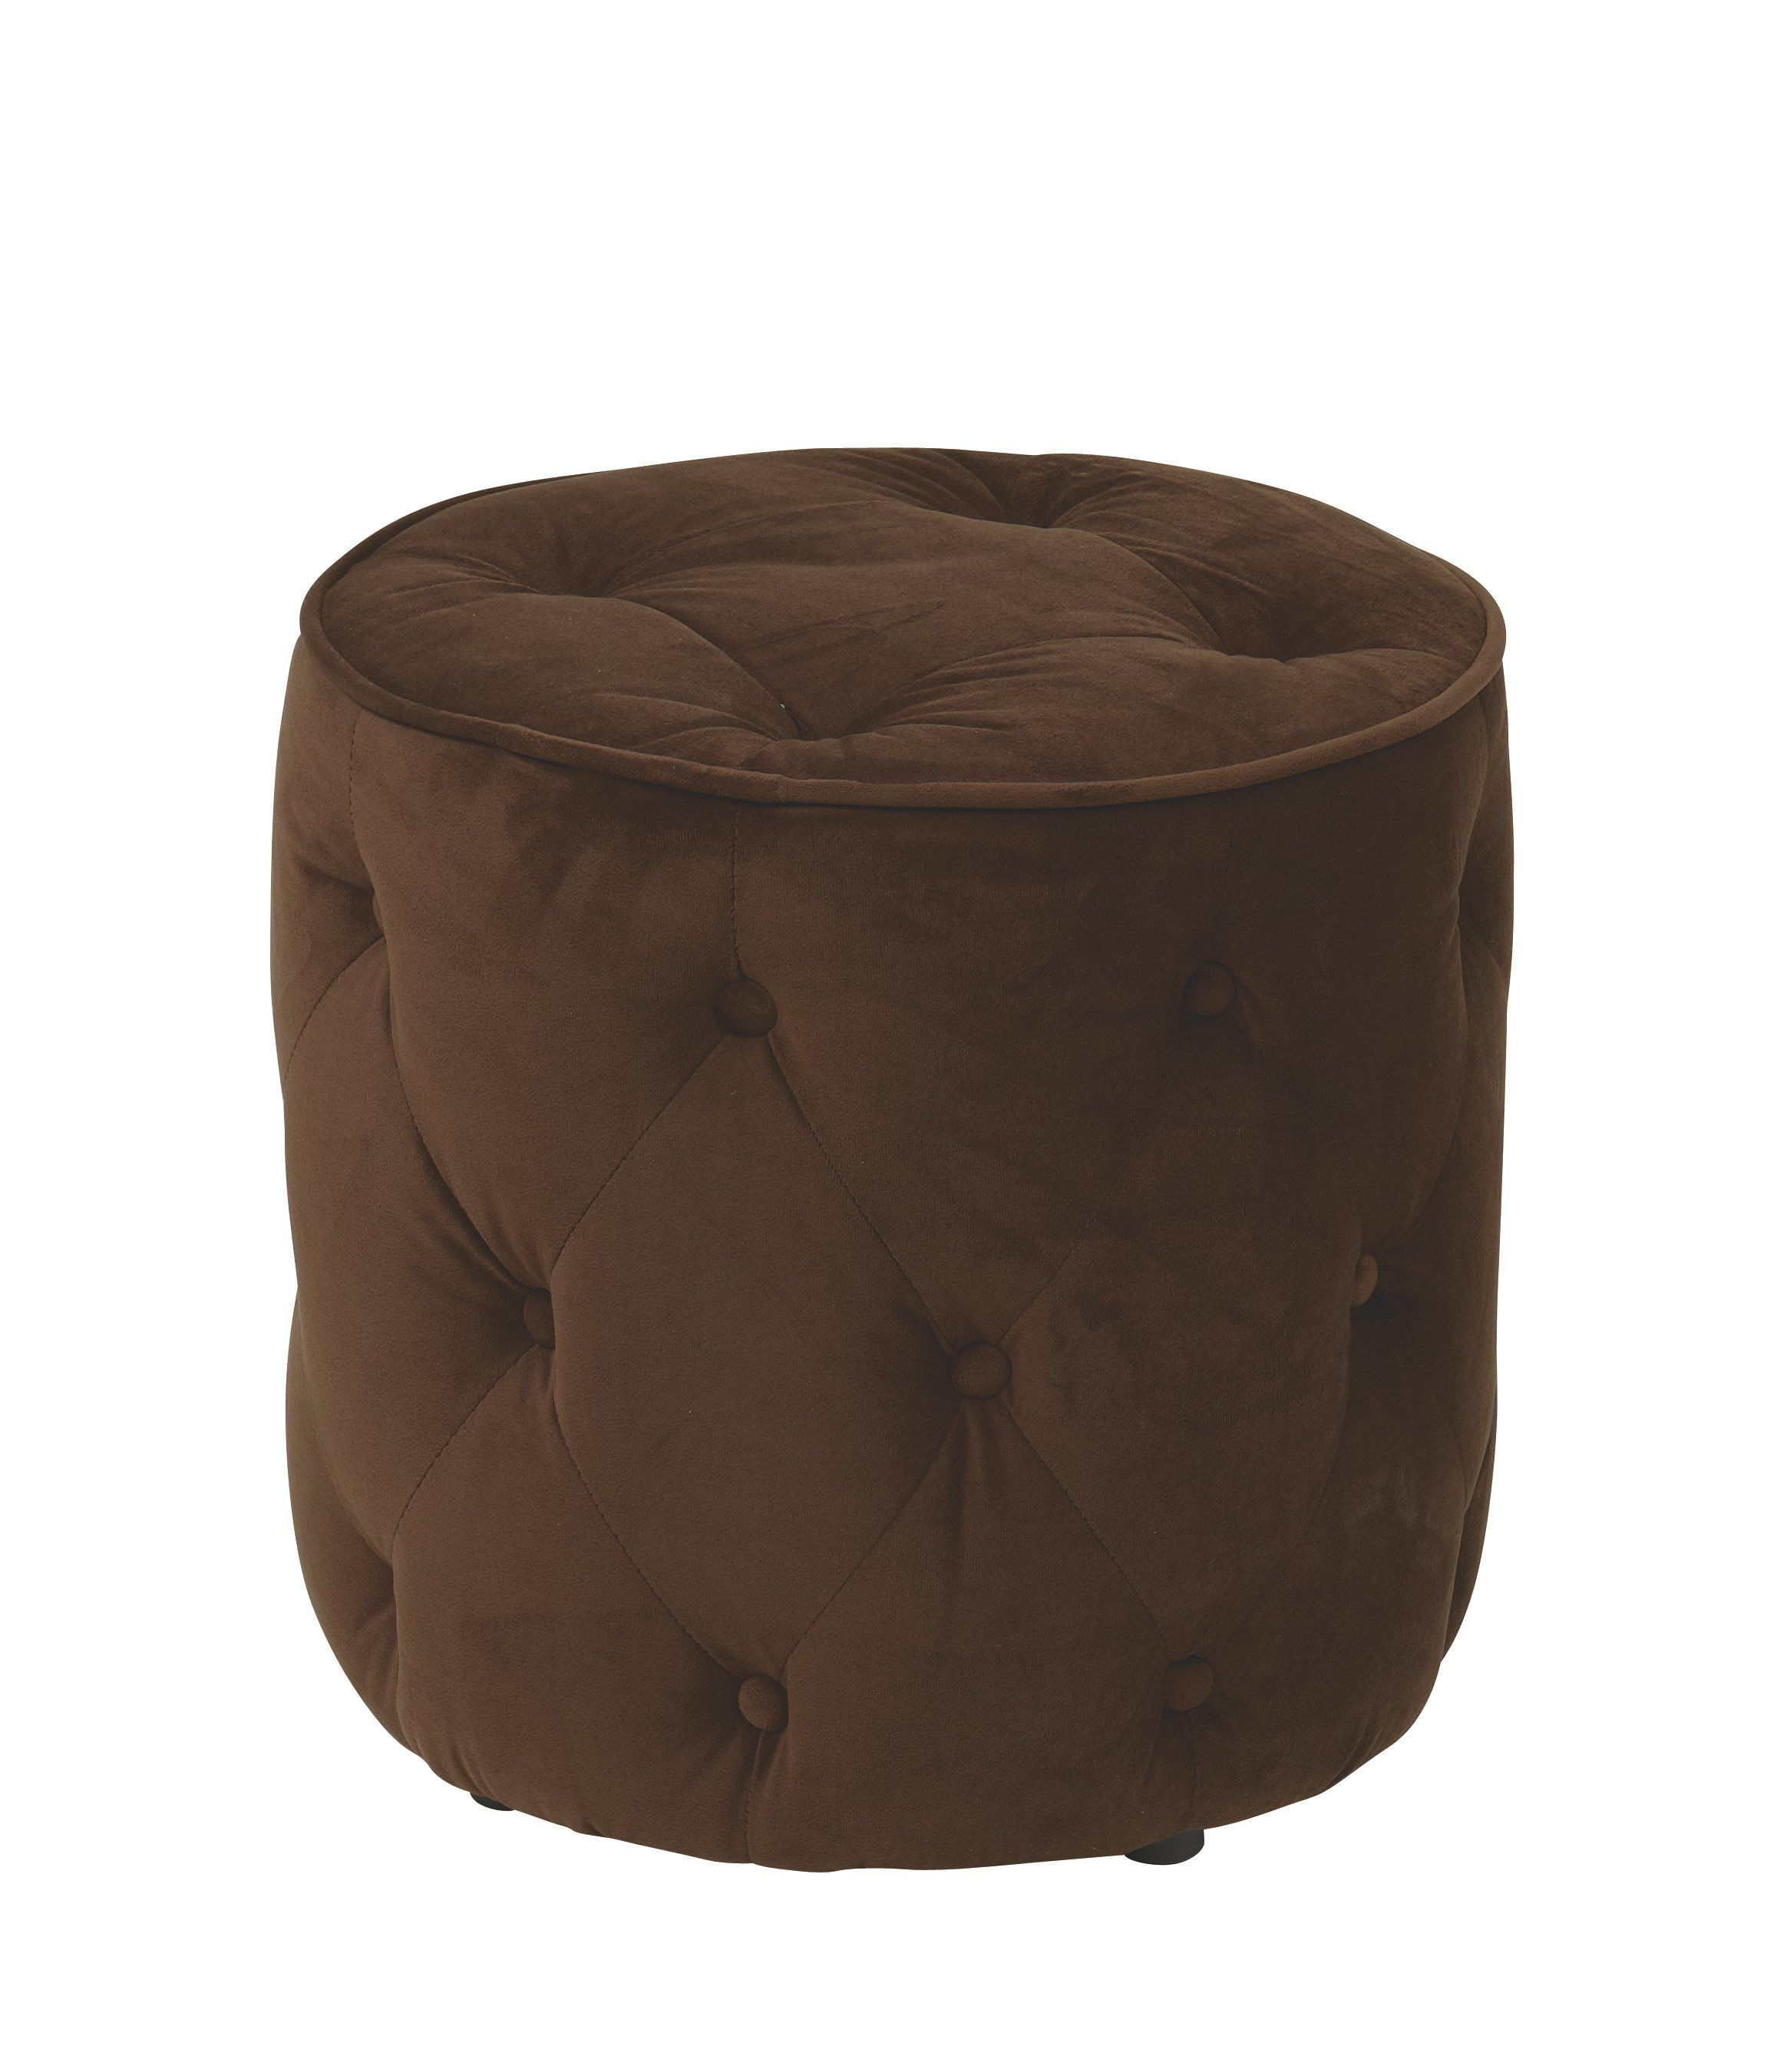 fice Star Chocolate Curves Tufted Round Ottoman